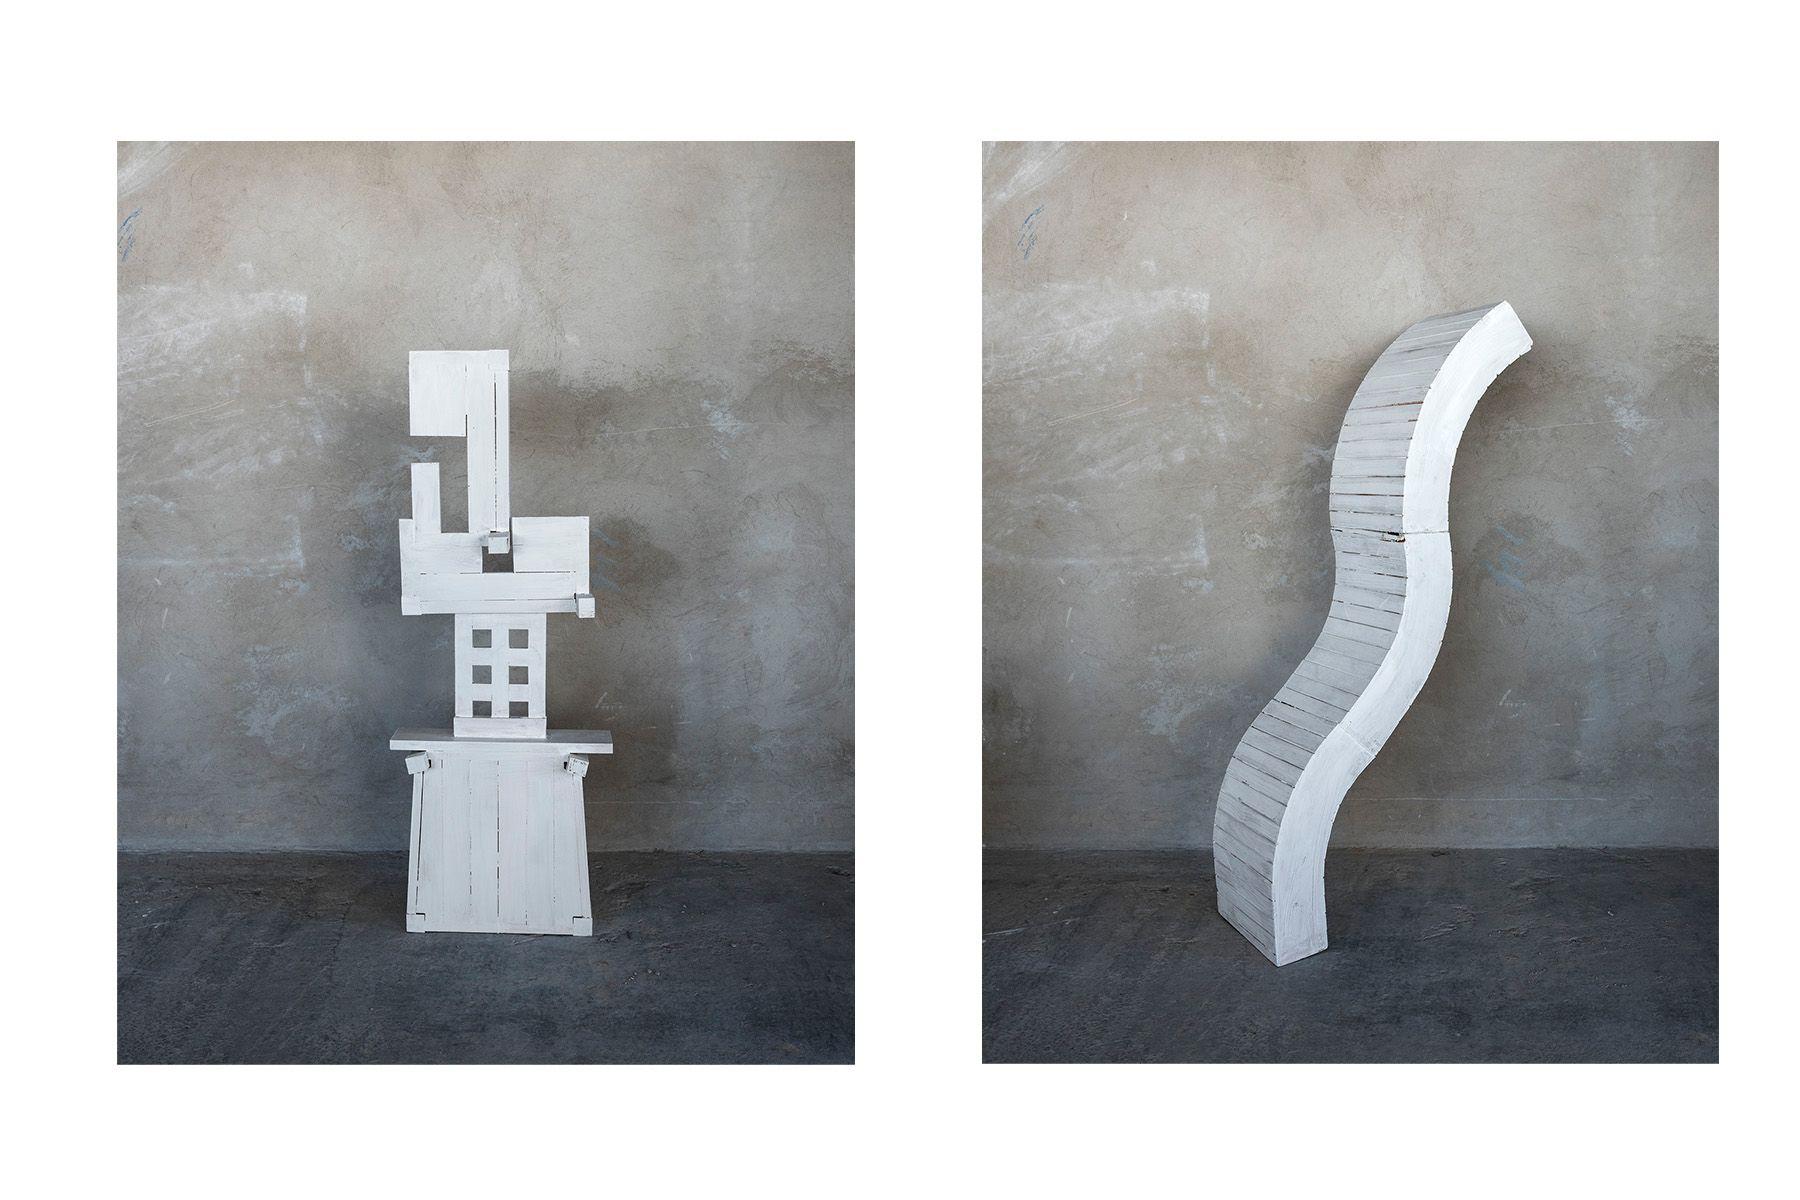 Furniture Totem (#2 left, #4, right)